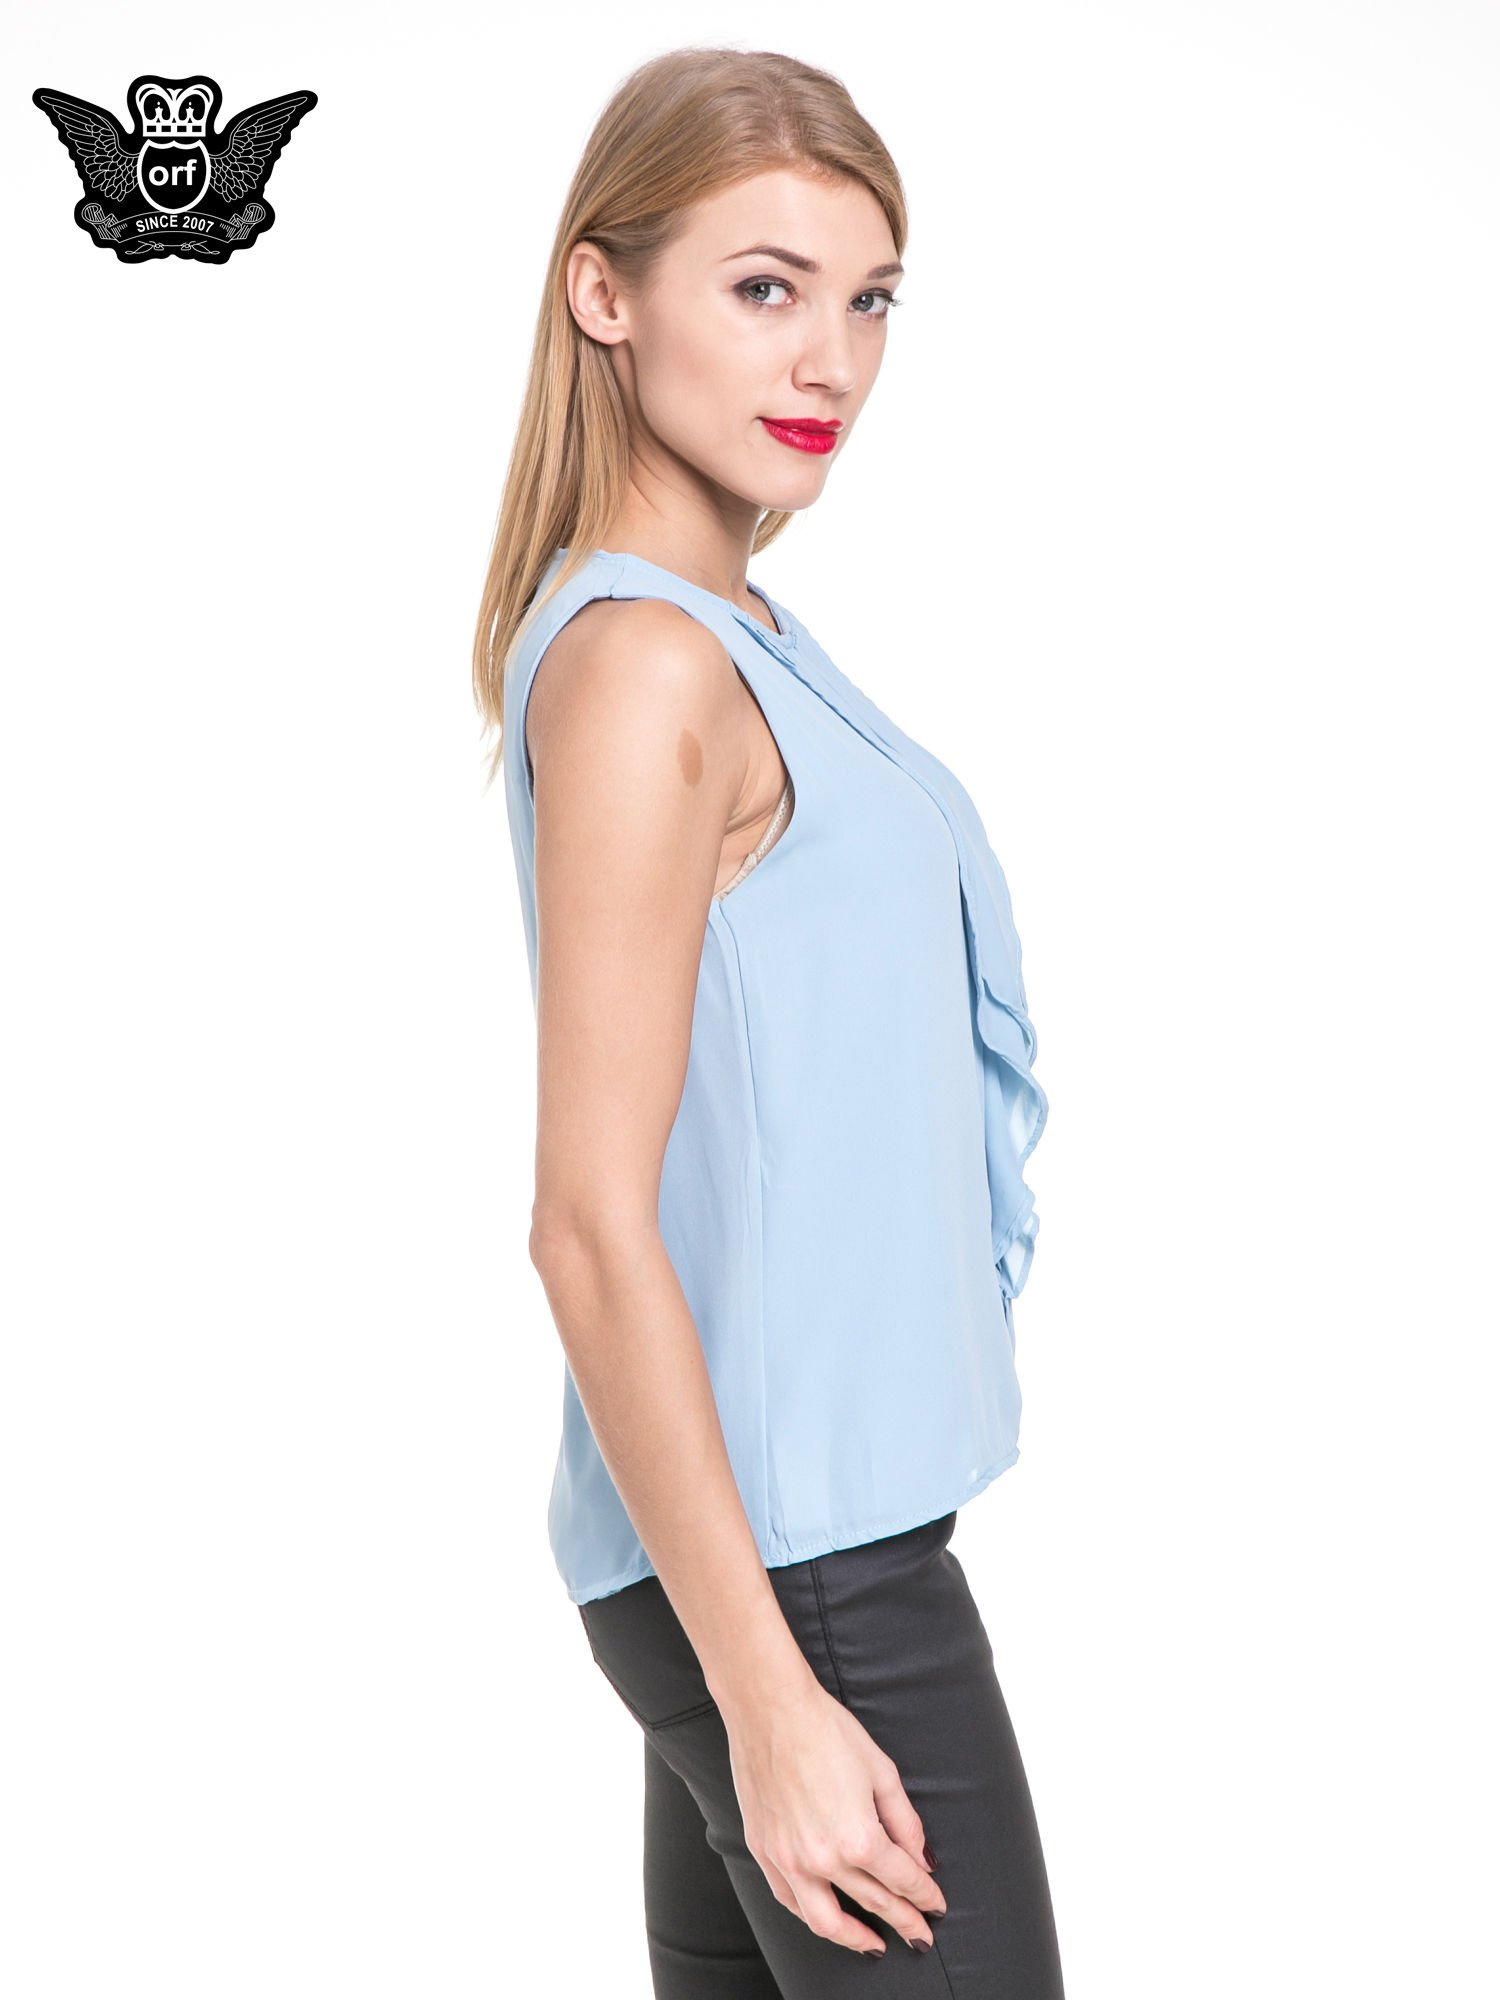 Niebieska elegancka koszula z żabotem                                  zdj.                                  3